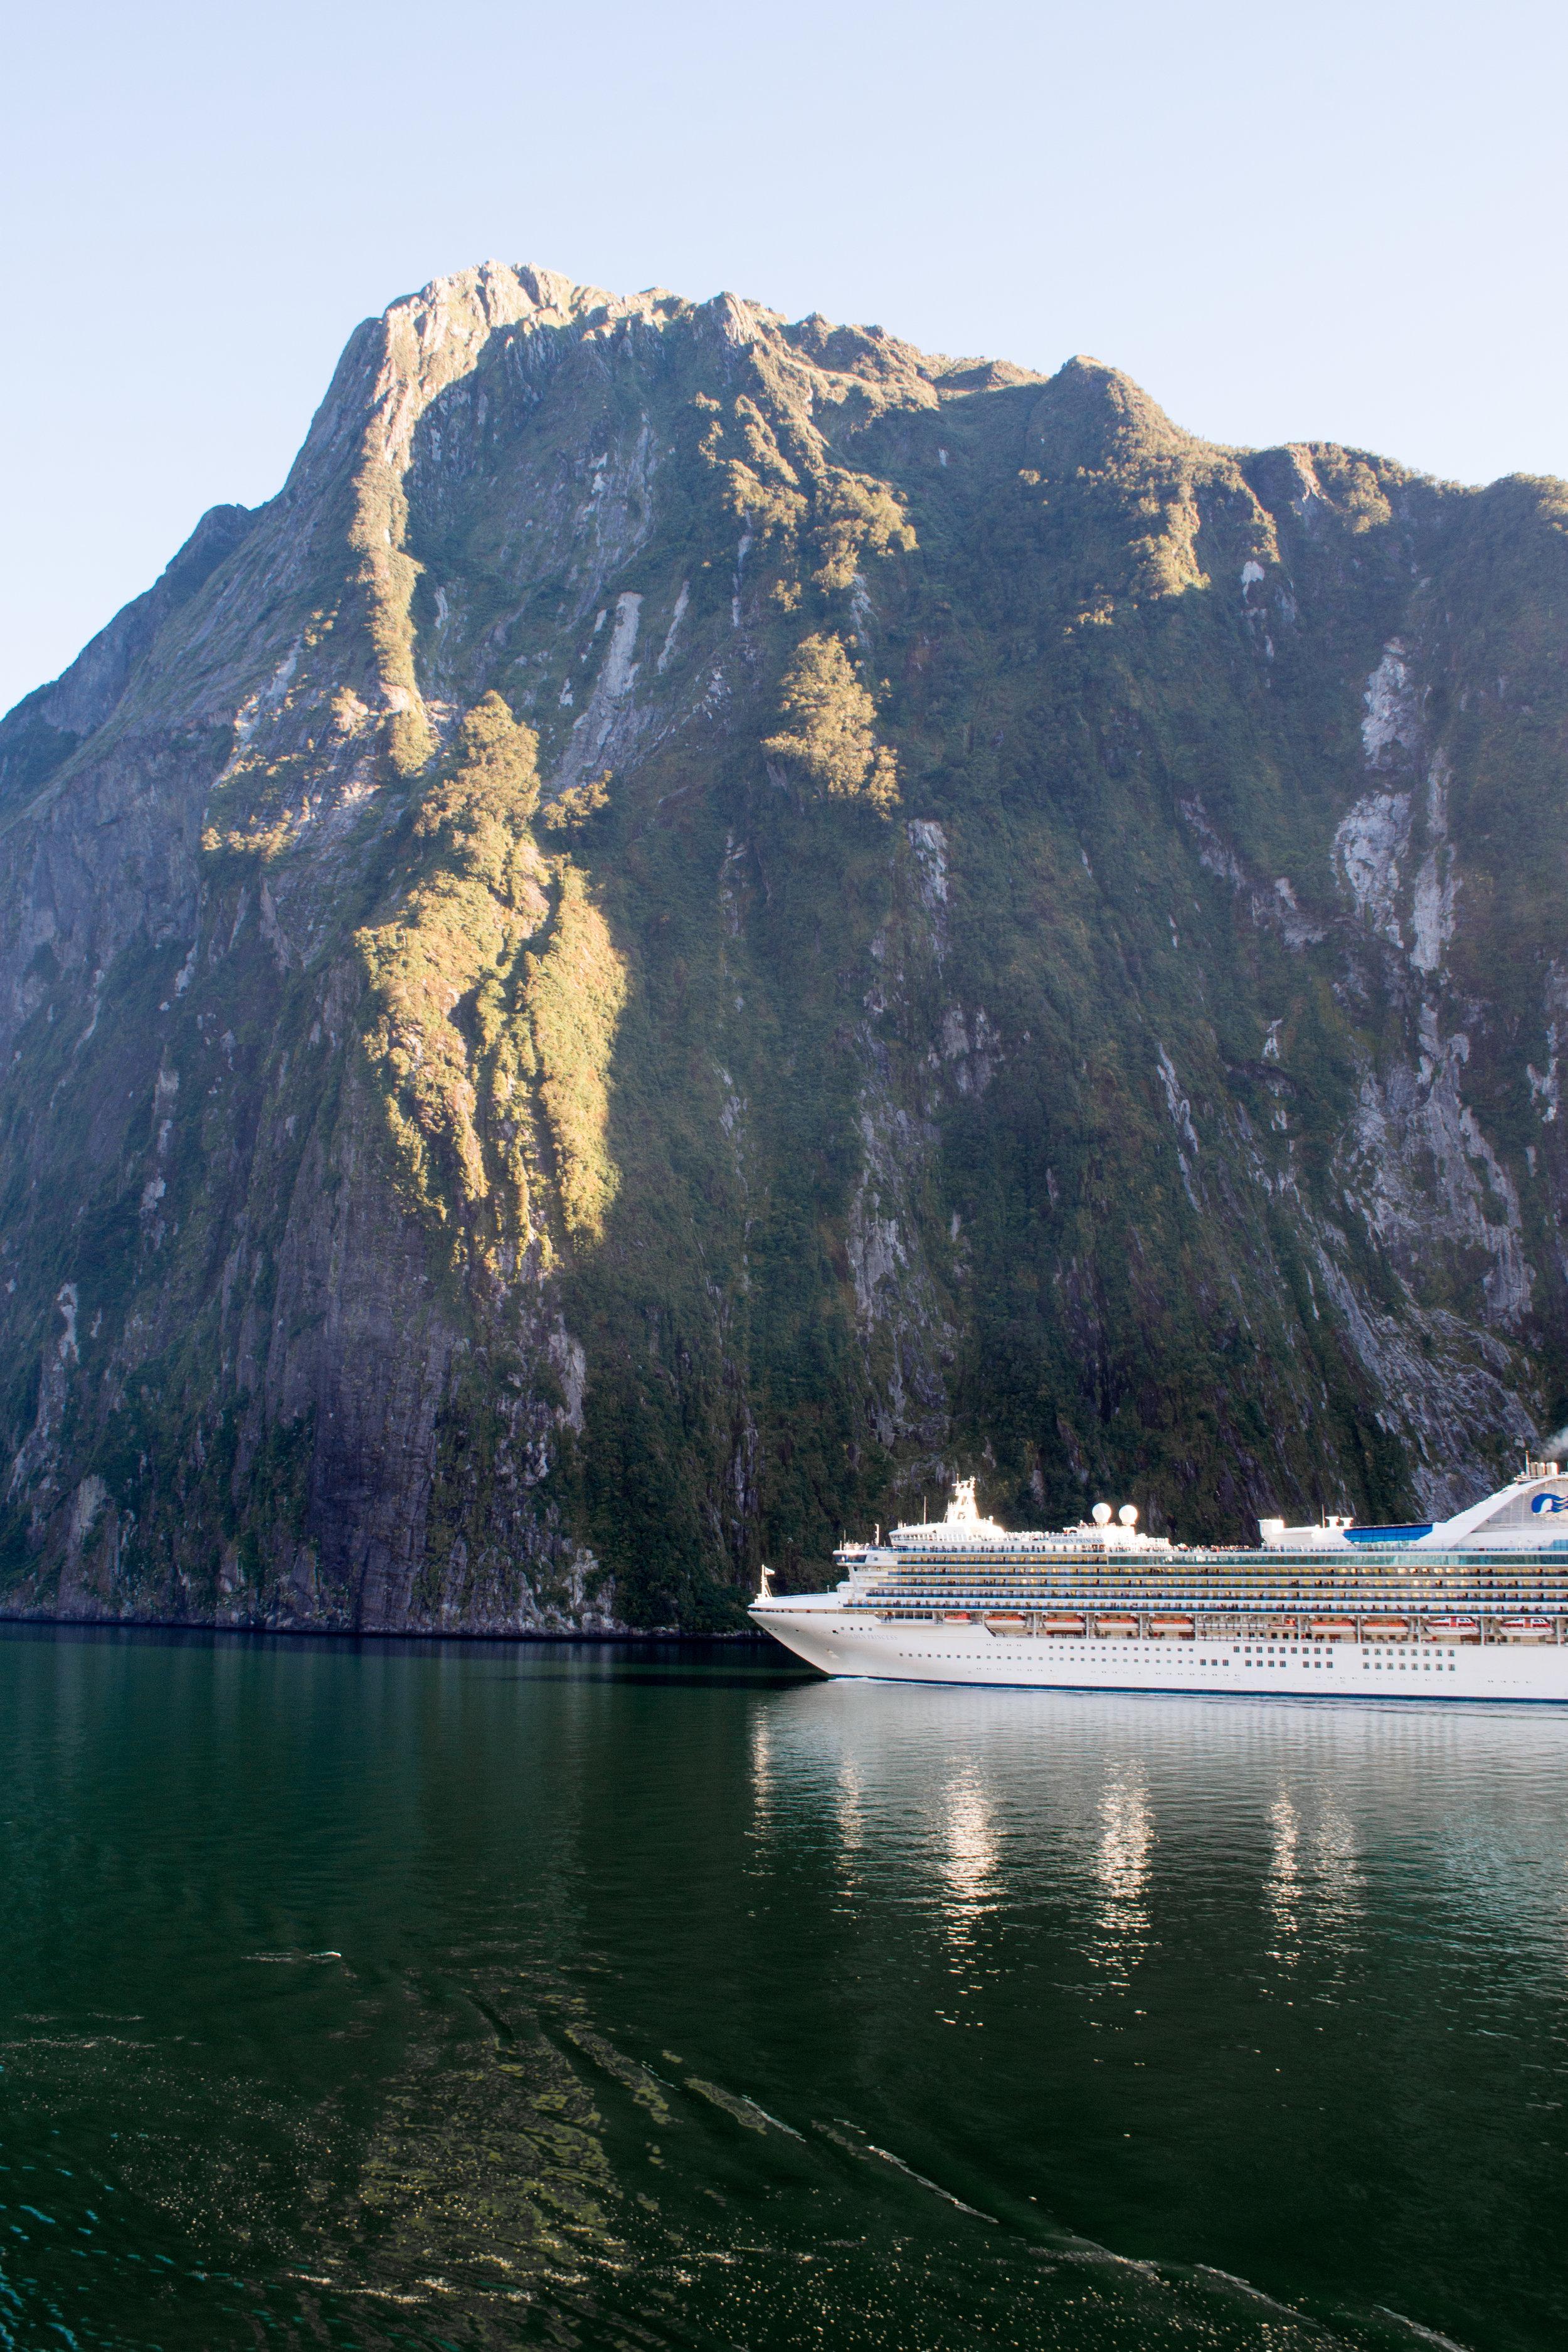 Princess Cruise Ship in Milford Sound